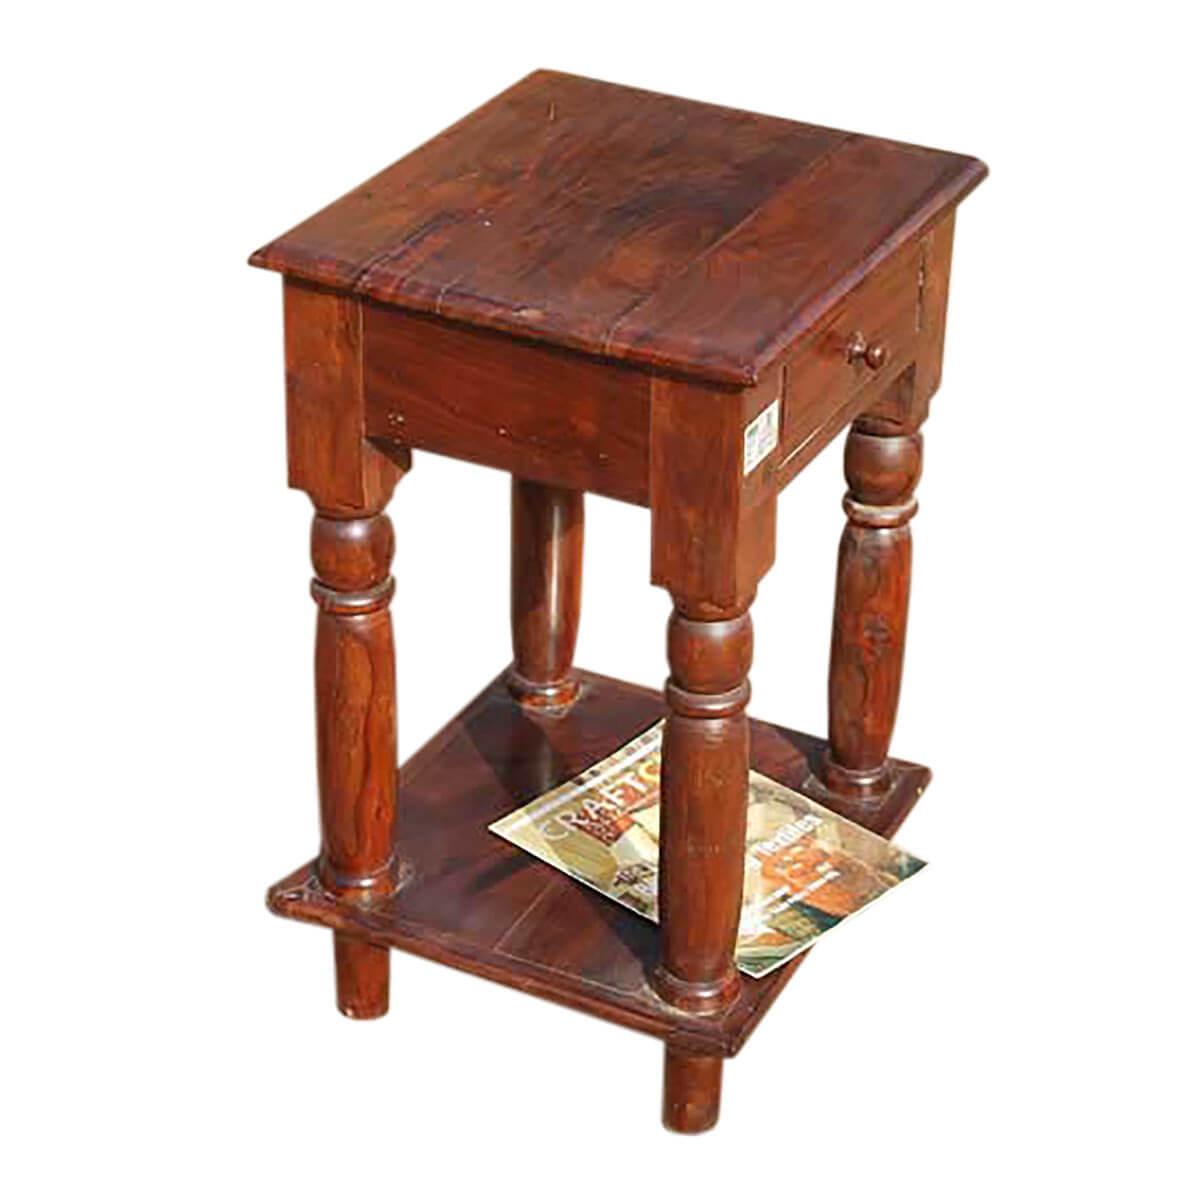 cowles solid wood 2 tier 1 drawer side end table. Black Bedroom Furniture Sets. Home Design Ideas